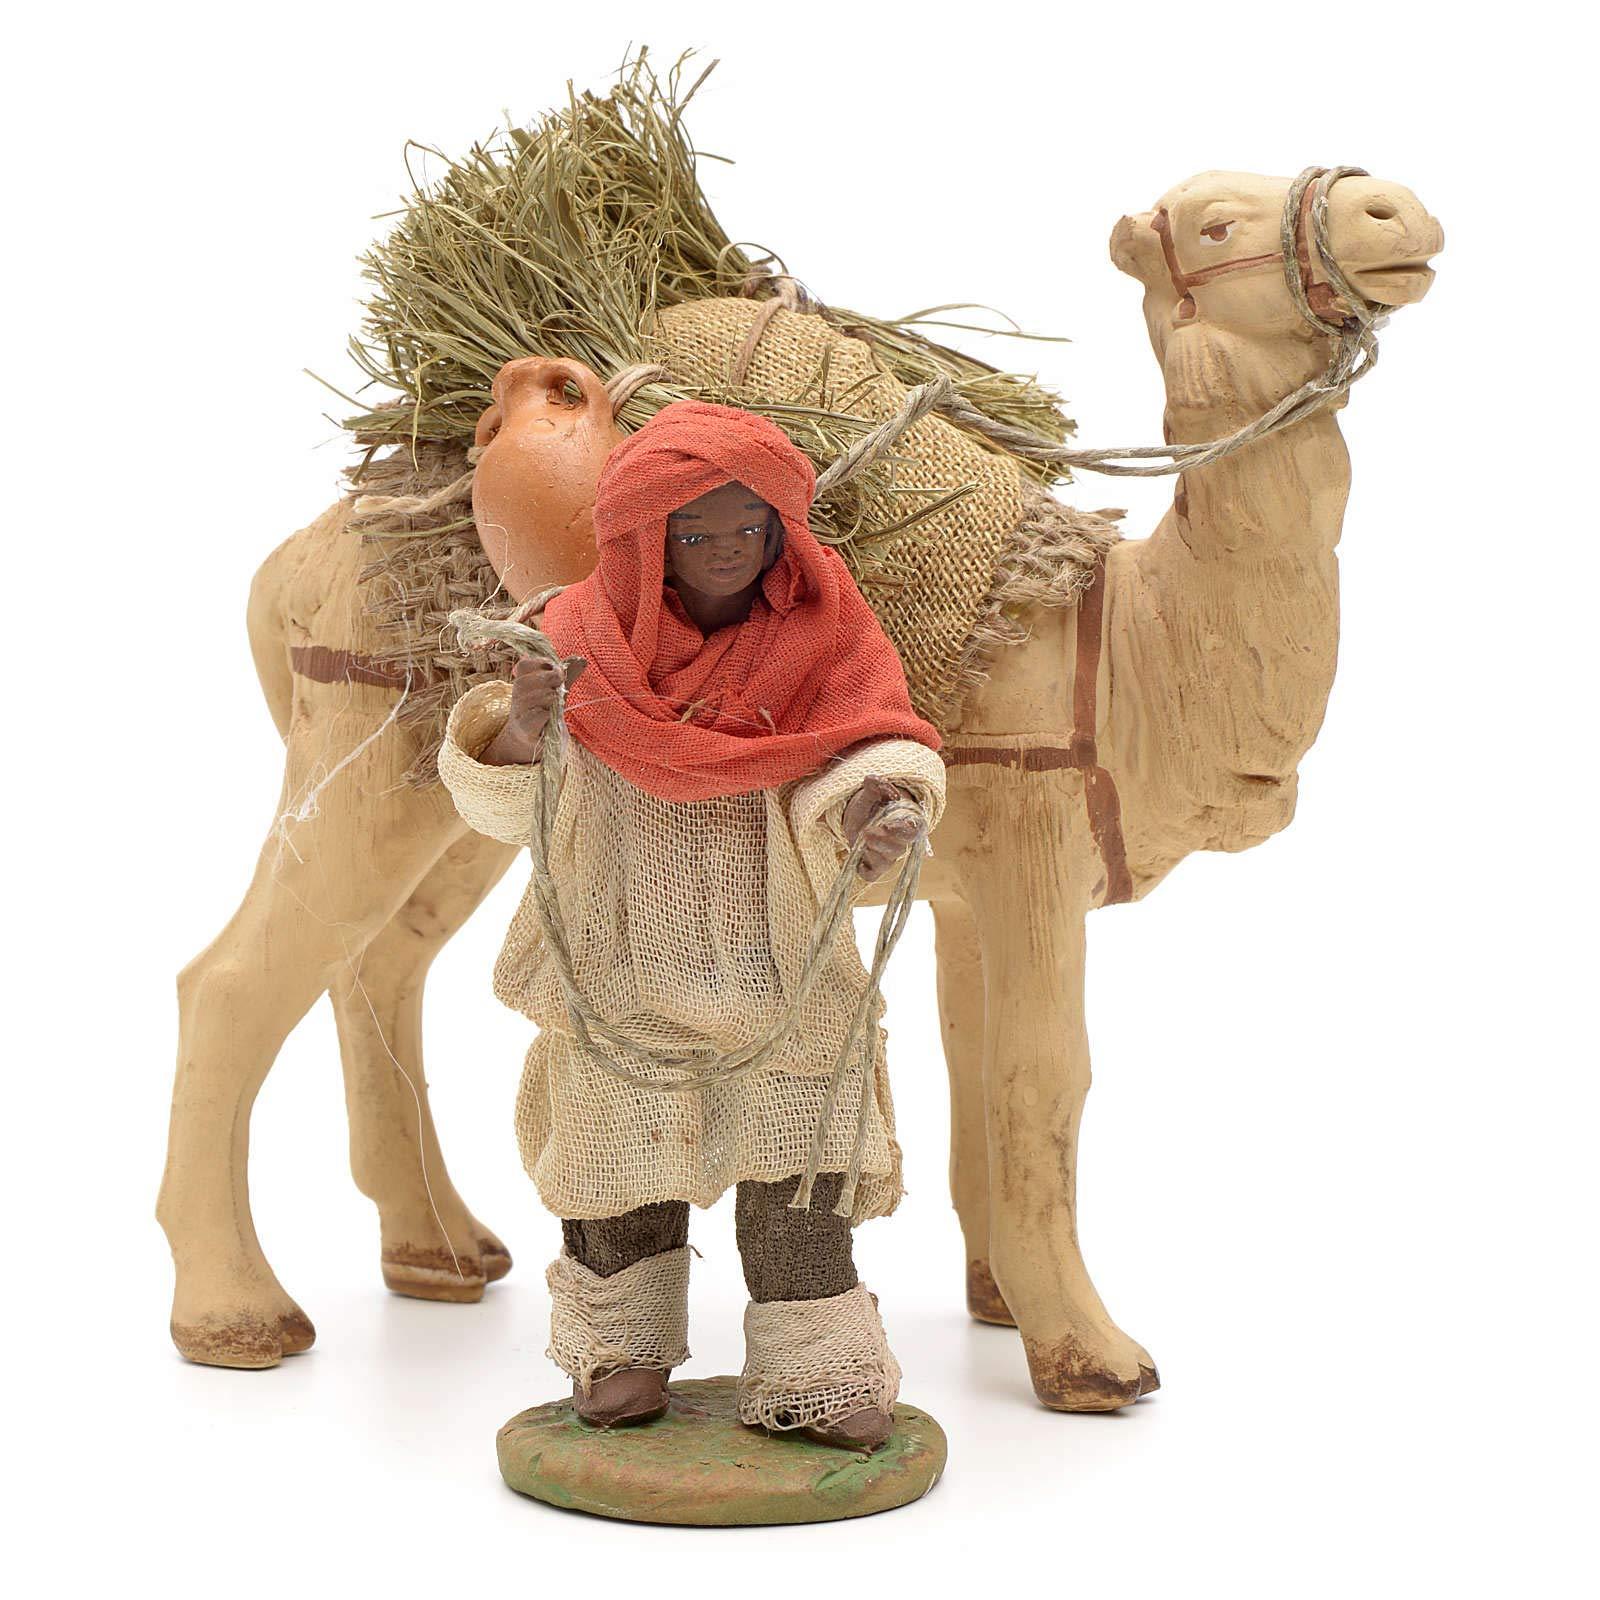 Holyart Nativity Set Accessory Dark cameleer with Camel 10 cm Figurines